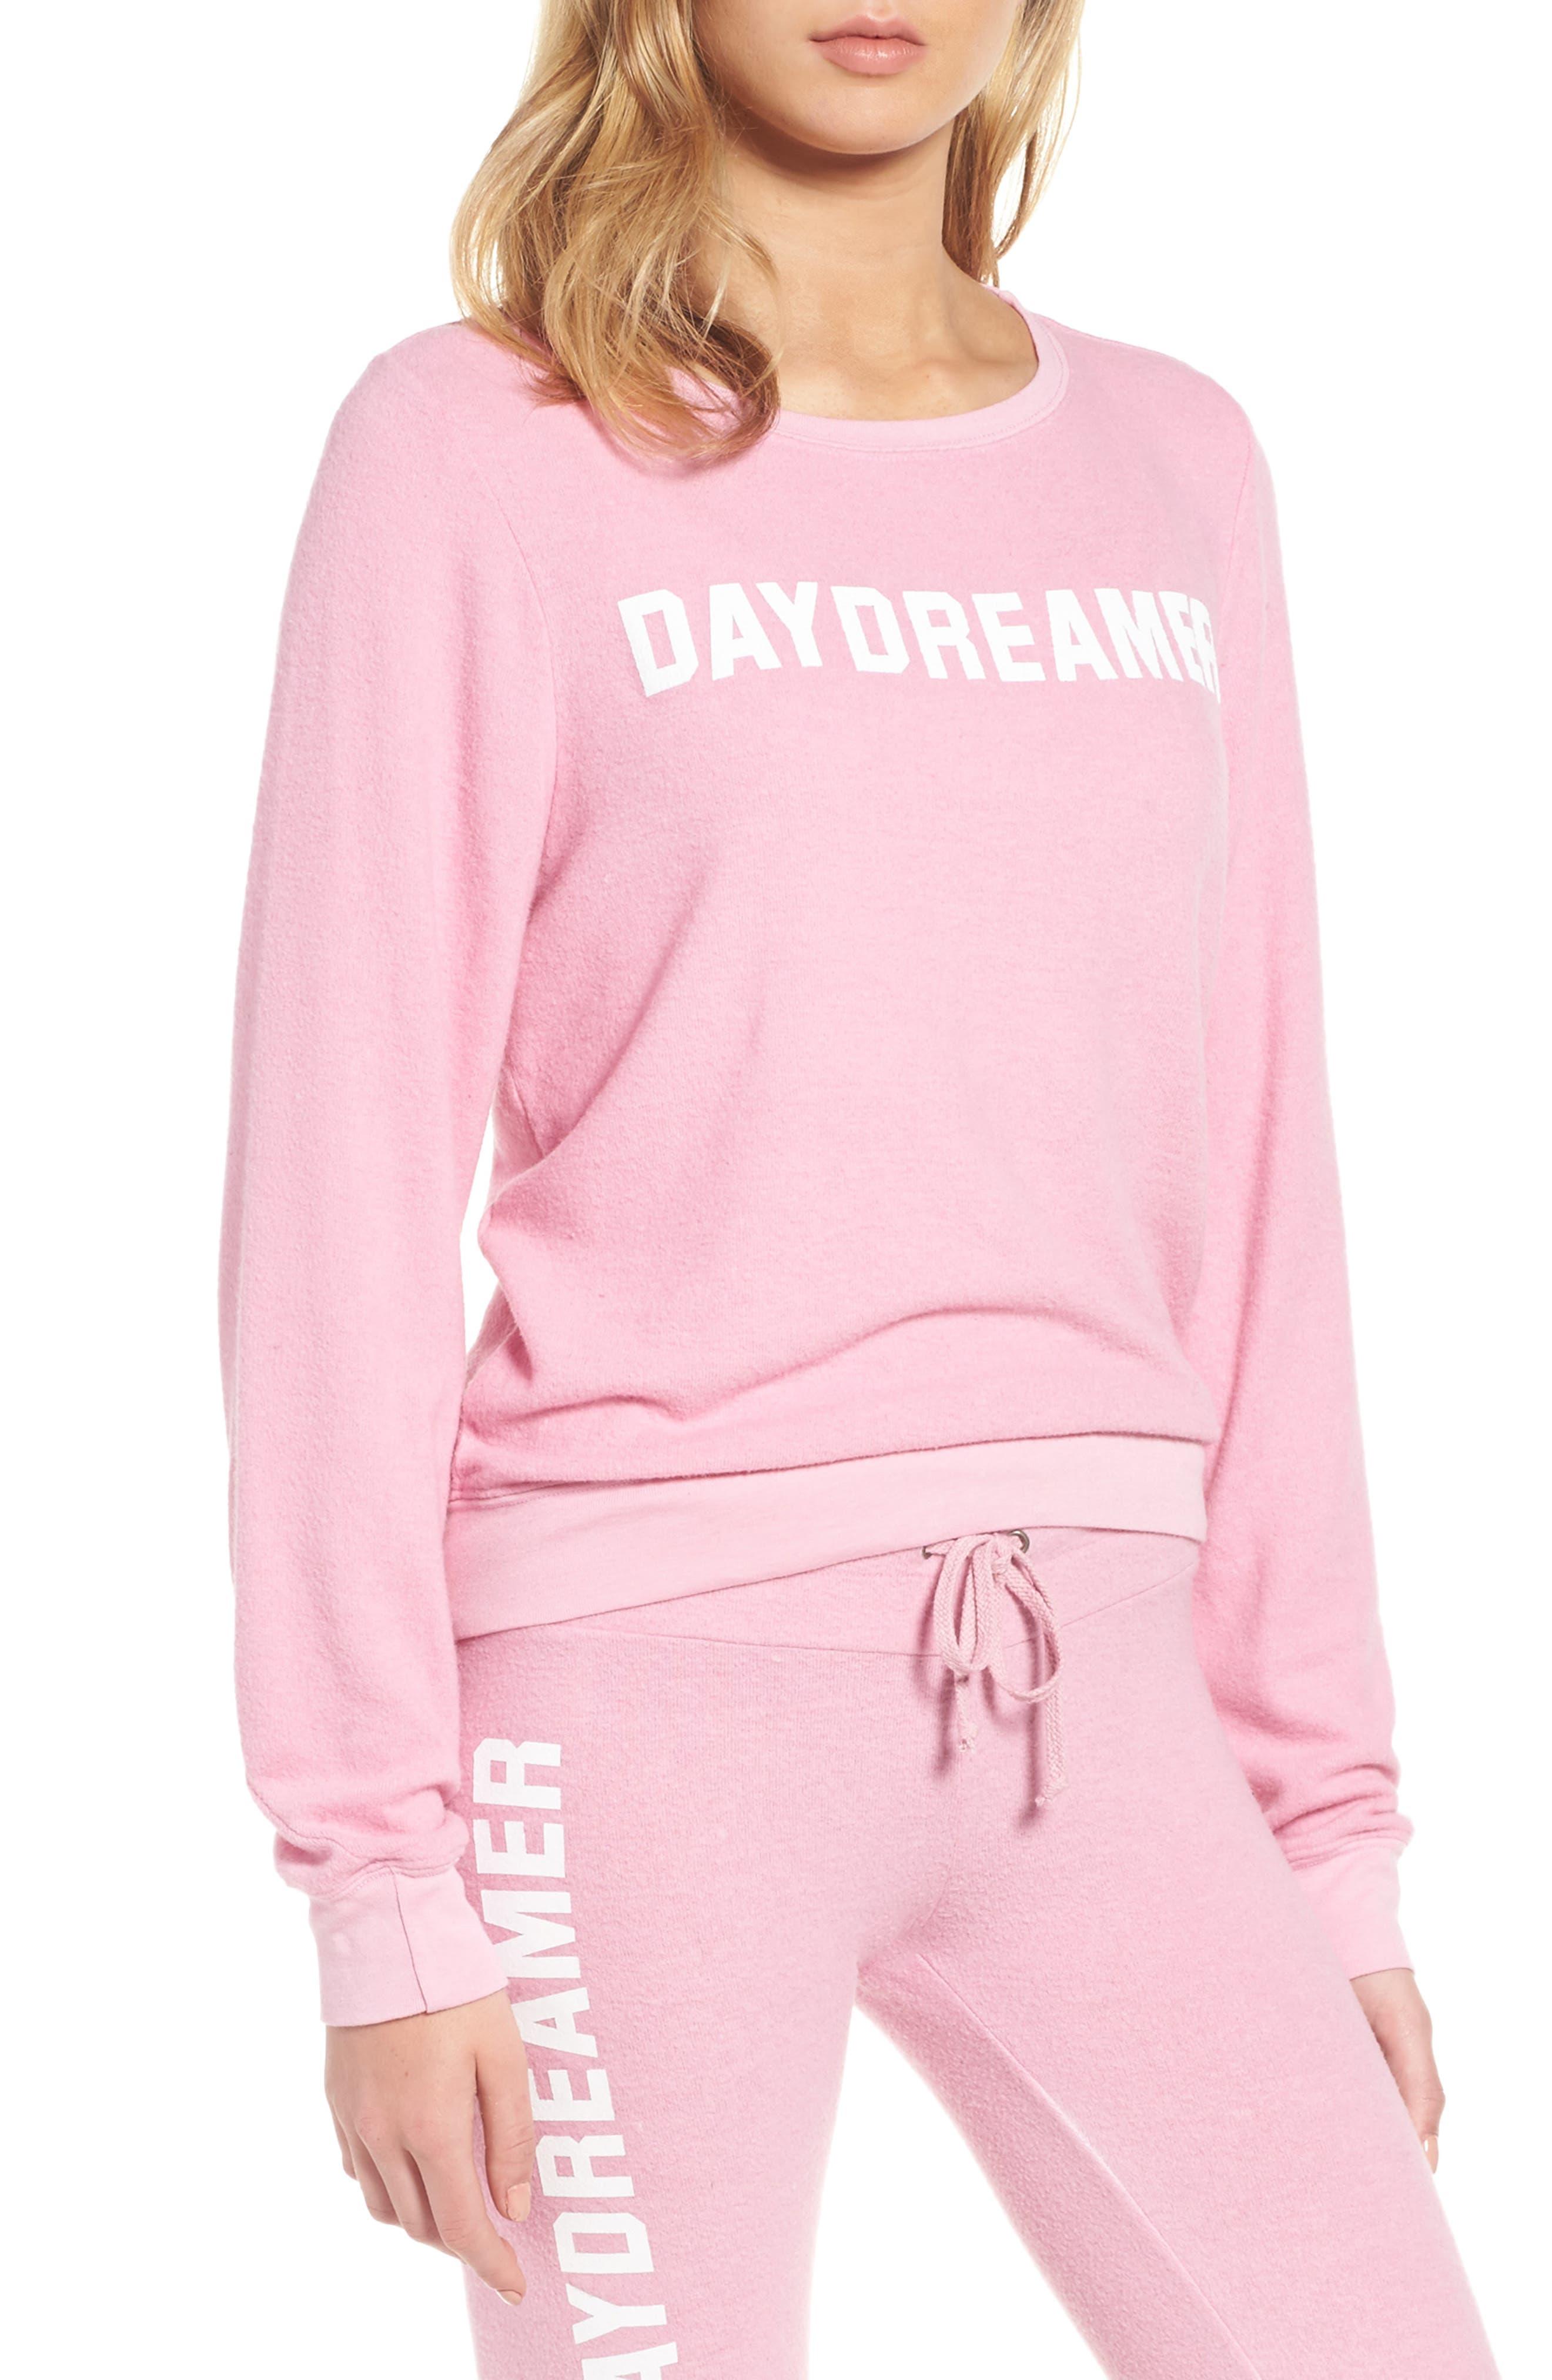 Daydreamer Sweatshirt,                         Main,                         color, 650